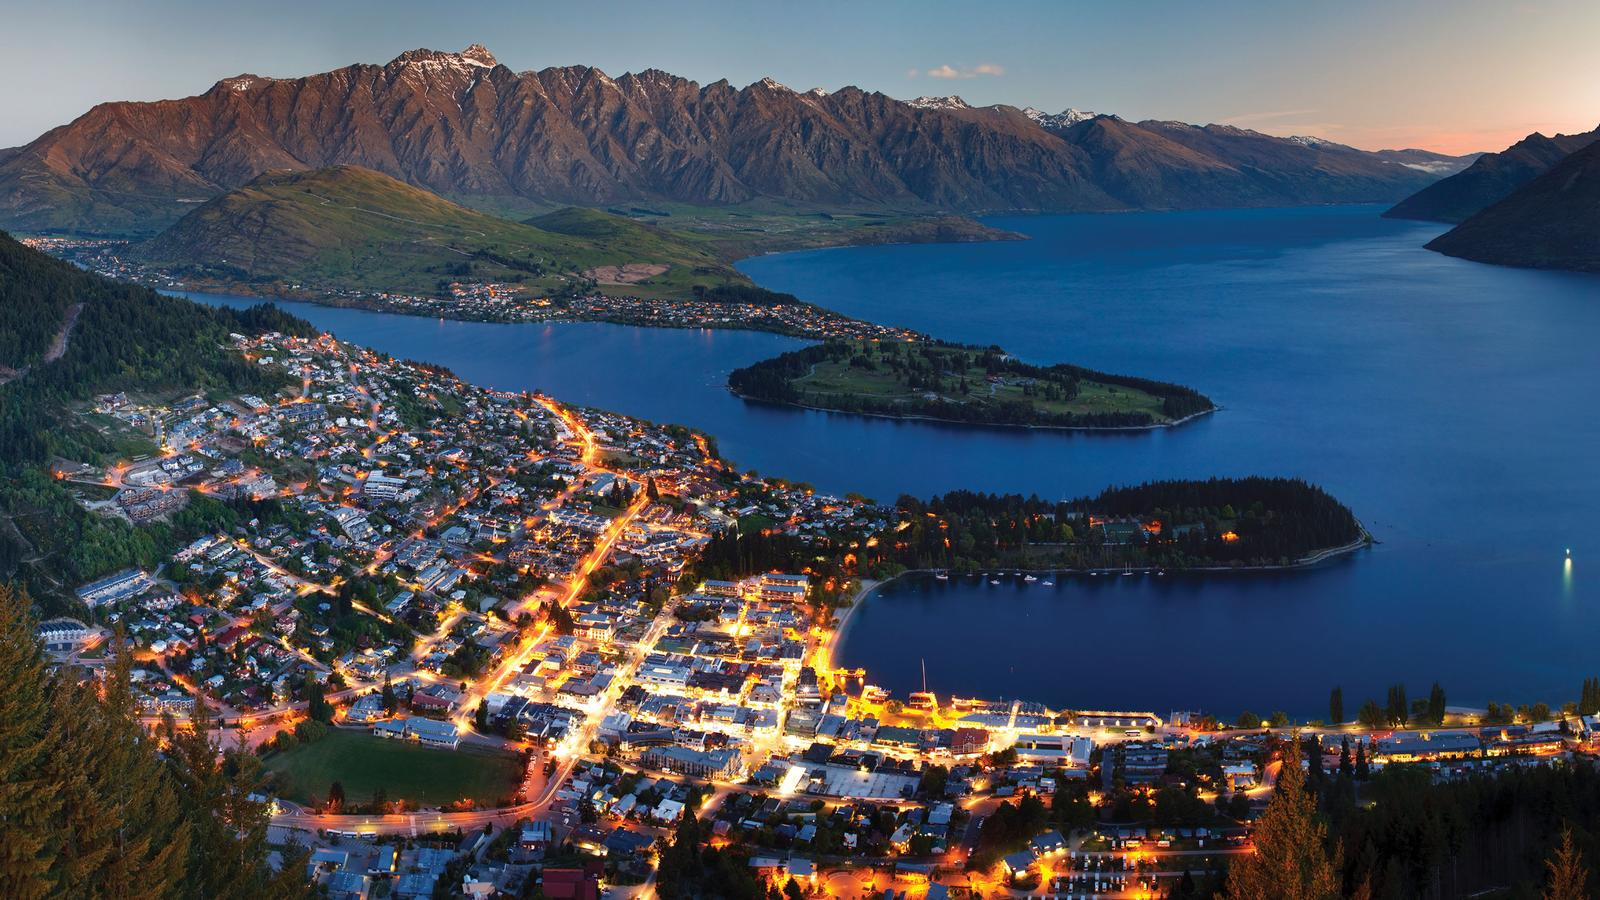 Black W. reccomend New Zealand